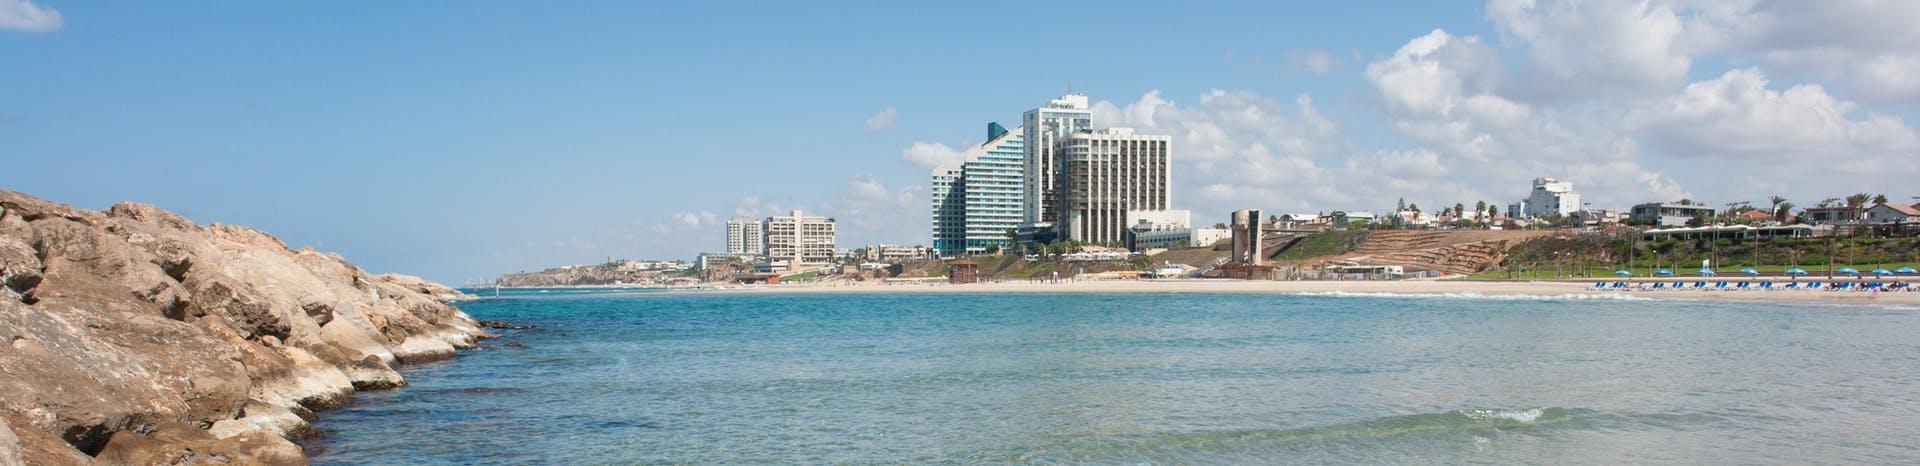 Picture of Herzliya